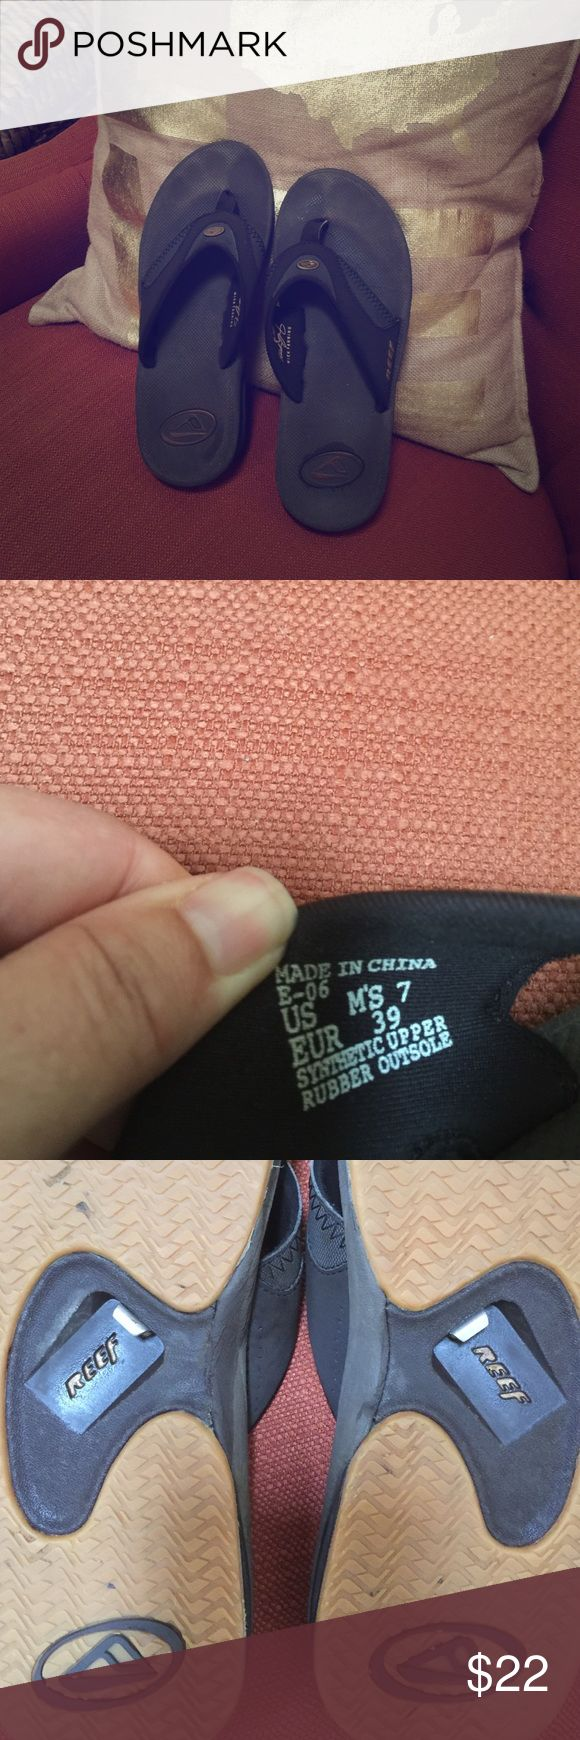 Women's sandals big w - Reef Shoes Big W Unisex Reef Sandals W Bottle Opener Dark Brown Good Condition Women